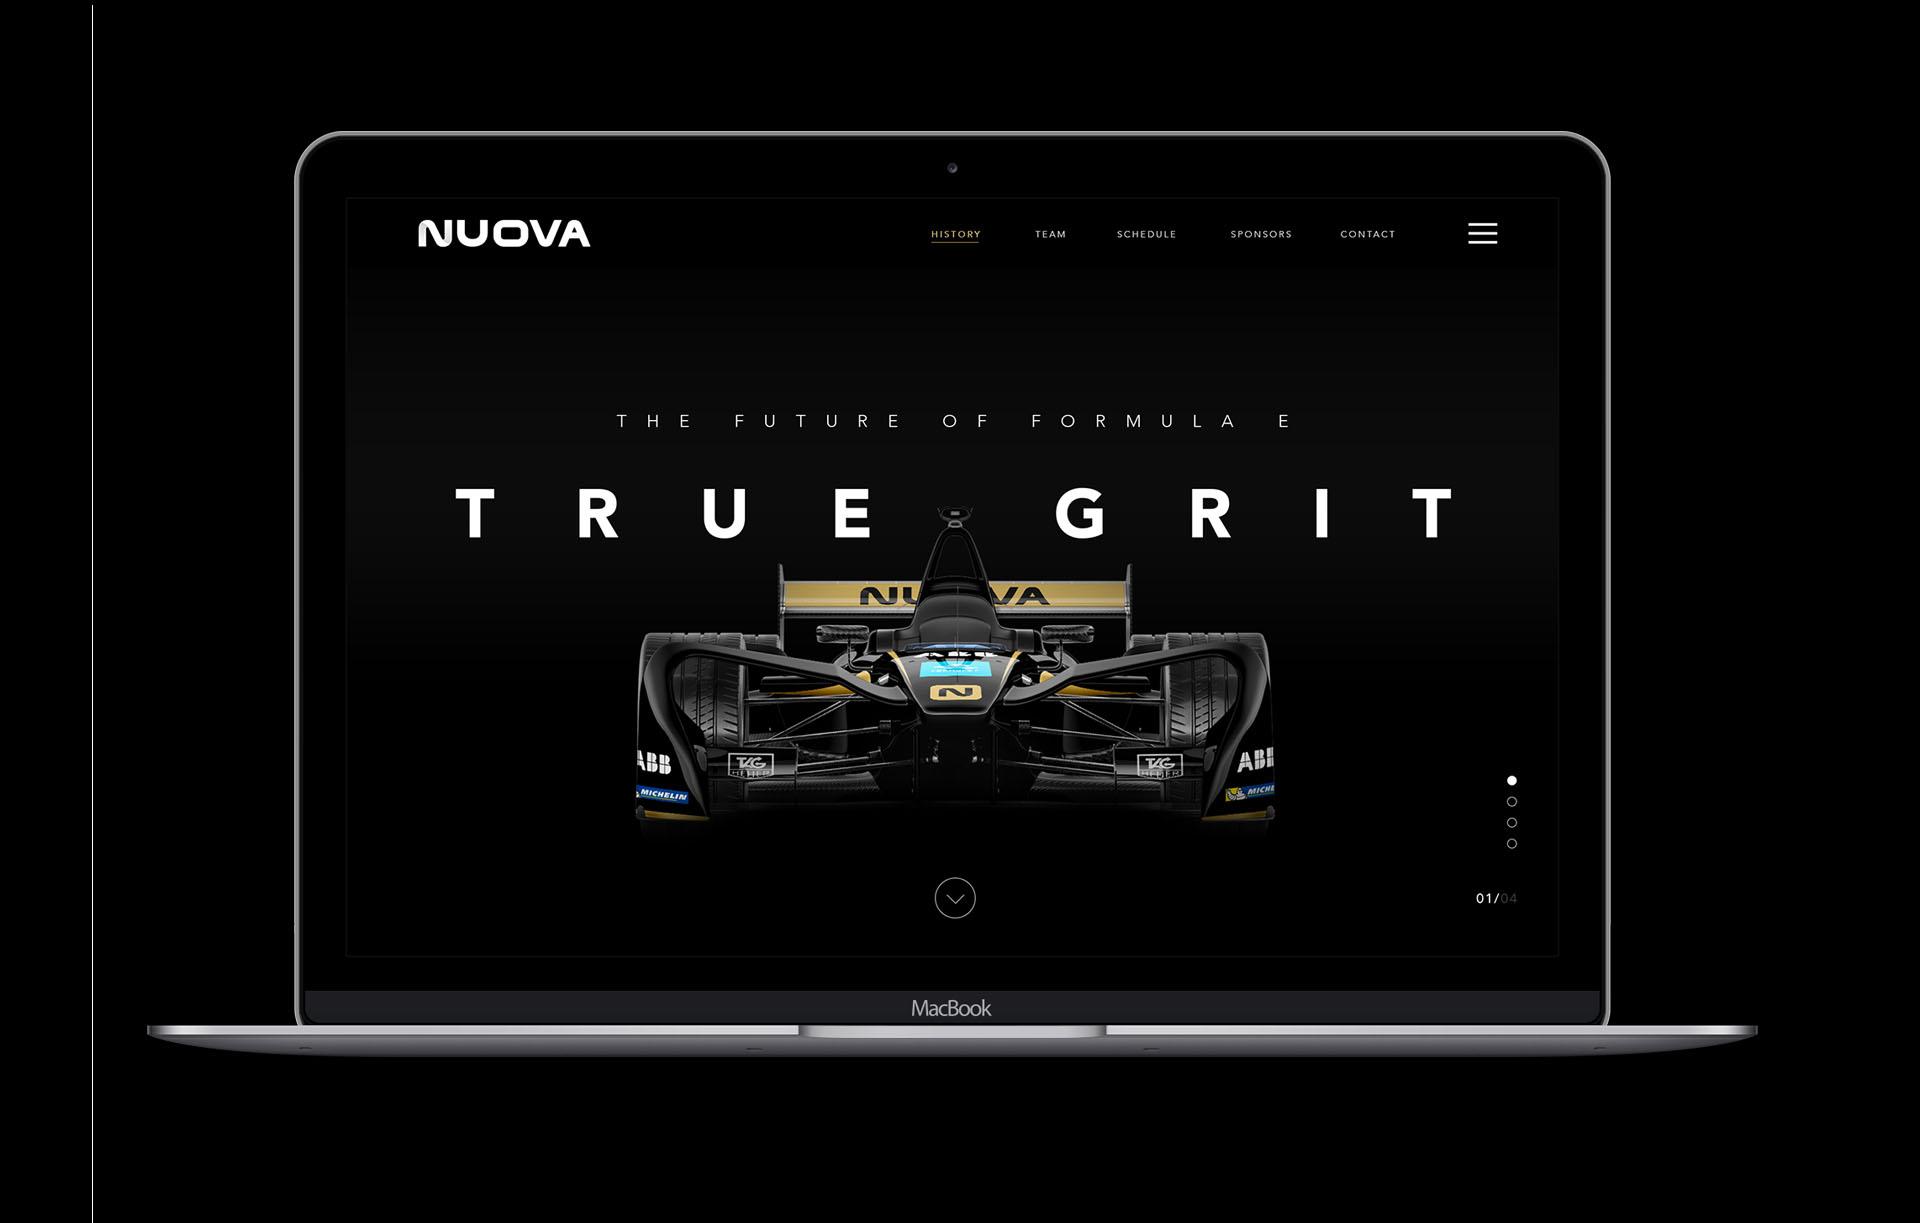 Nuova digital desktop